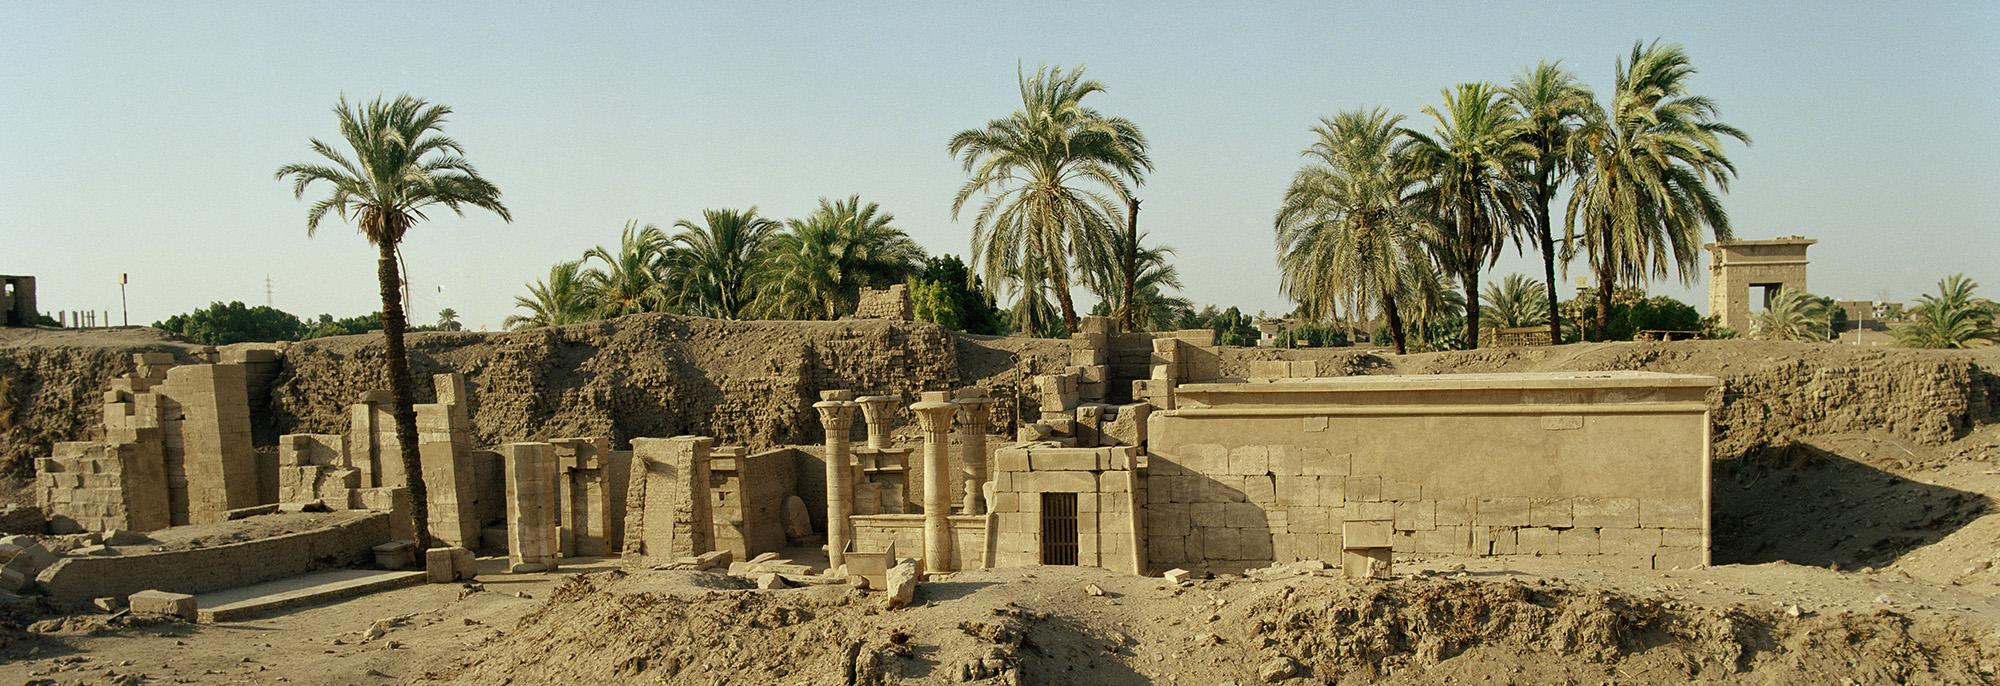 Temple de Ptah / Temple of PTah